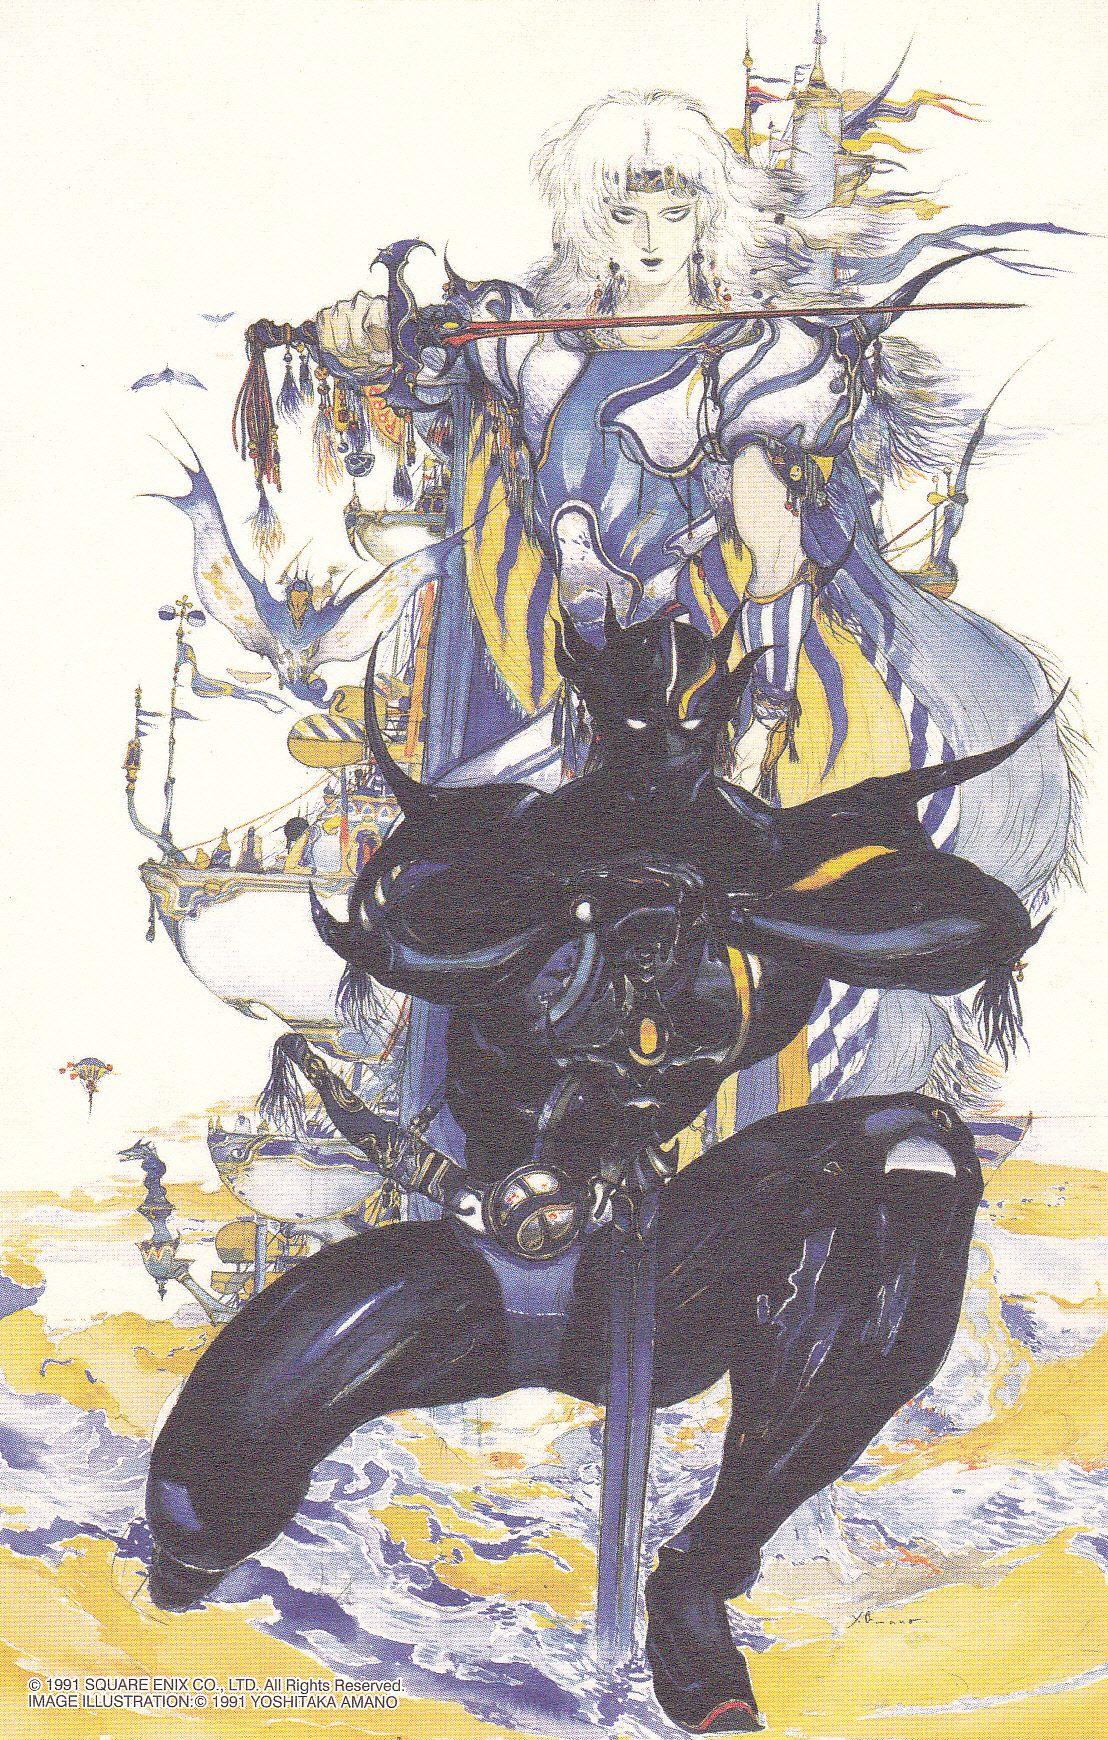 Cecil Harvey From Final Fantasy 4 By Yoshitaka Amano Final Fantasy Tattoo Final Fantasy Iv Final Fantasy Artwork